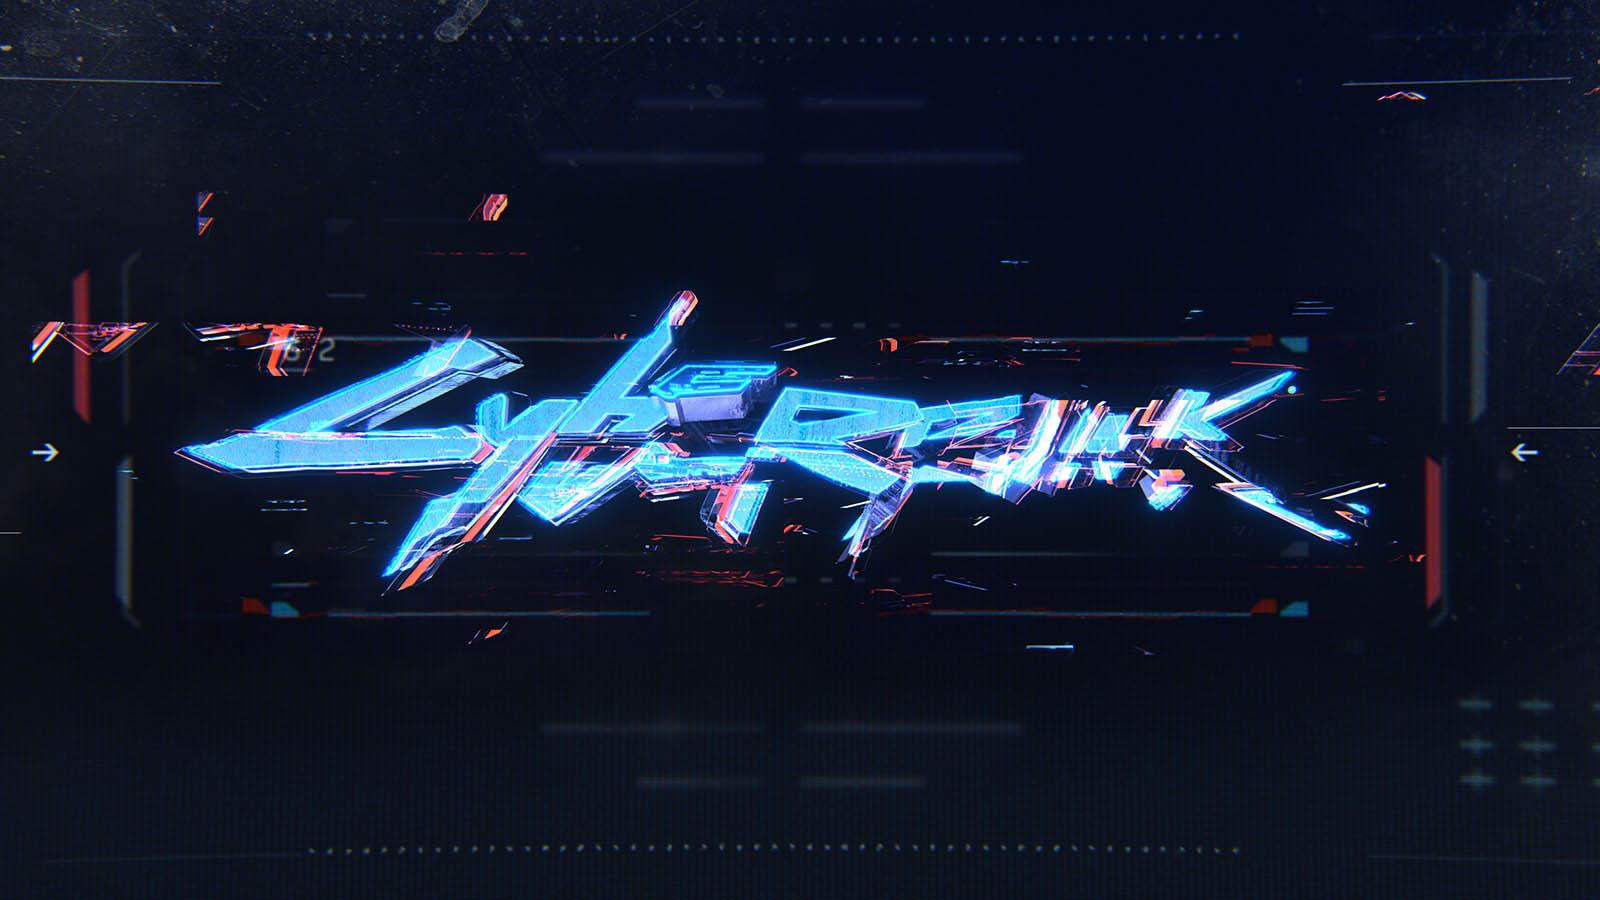 Cyberpunk_LogoSting_TerritoryStudio_006